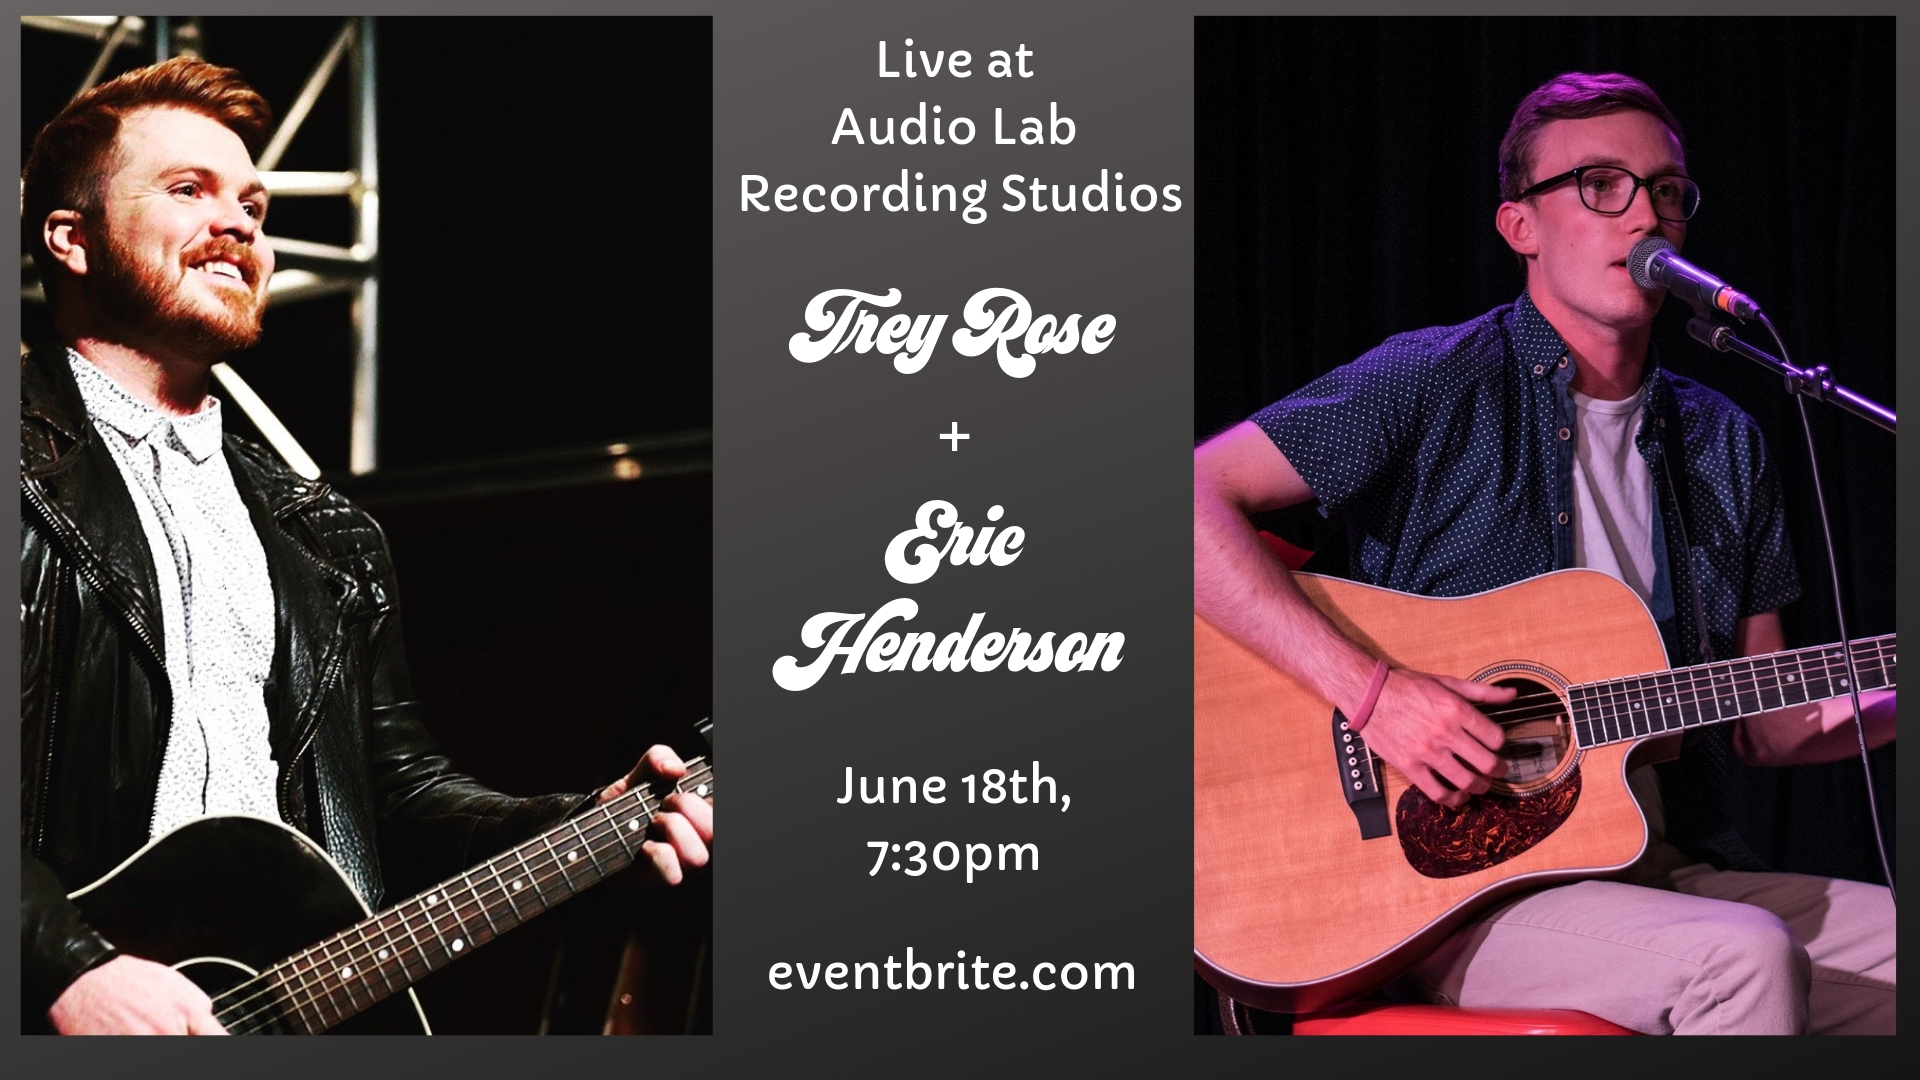 Trey Rose + Eric Henderson FB event.jpg